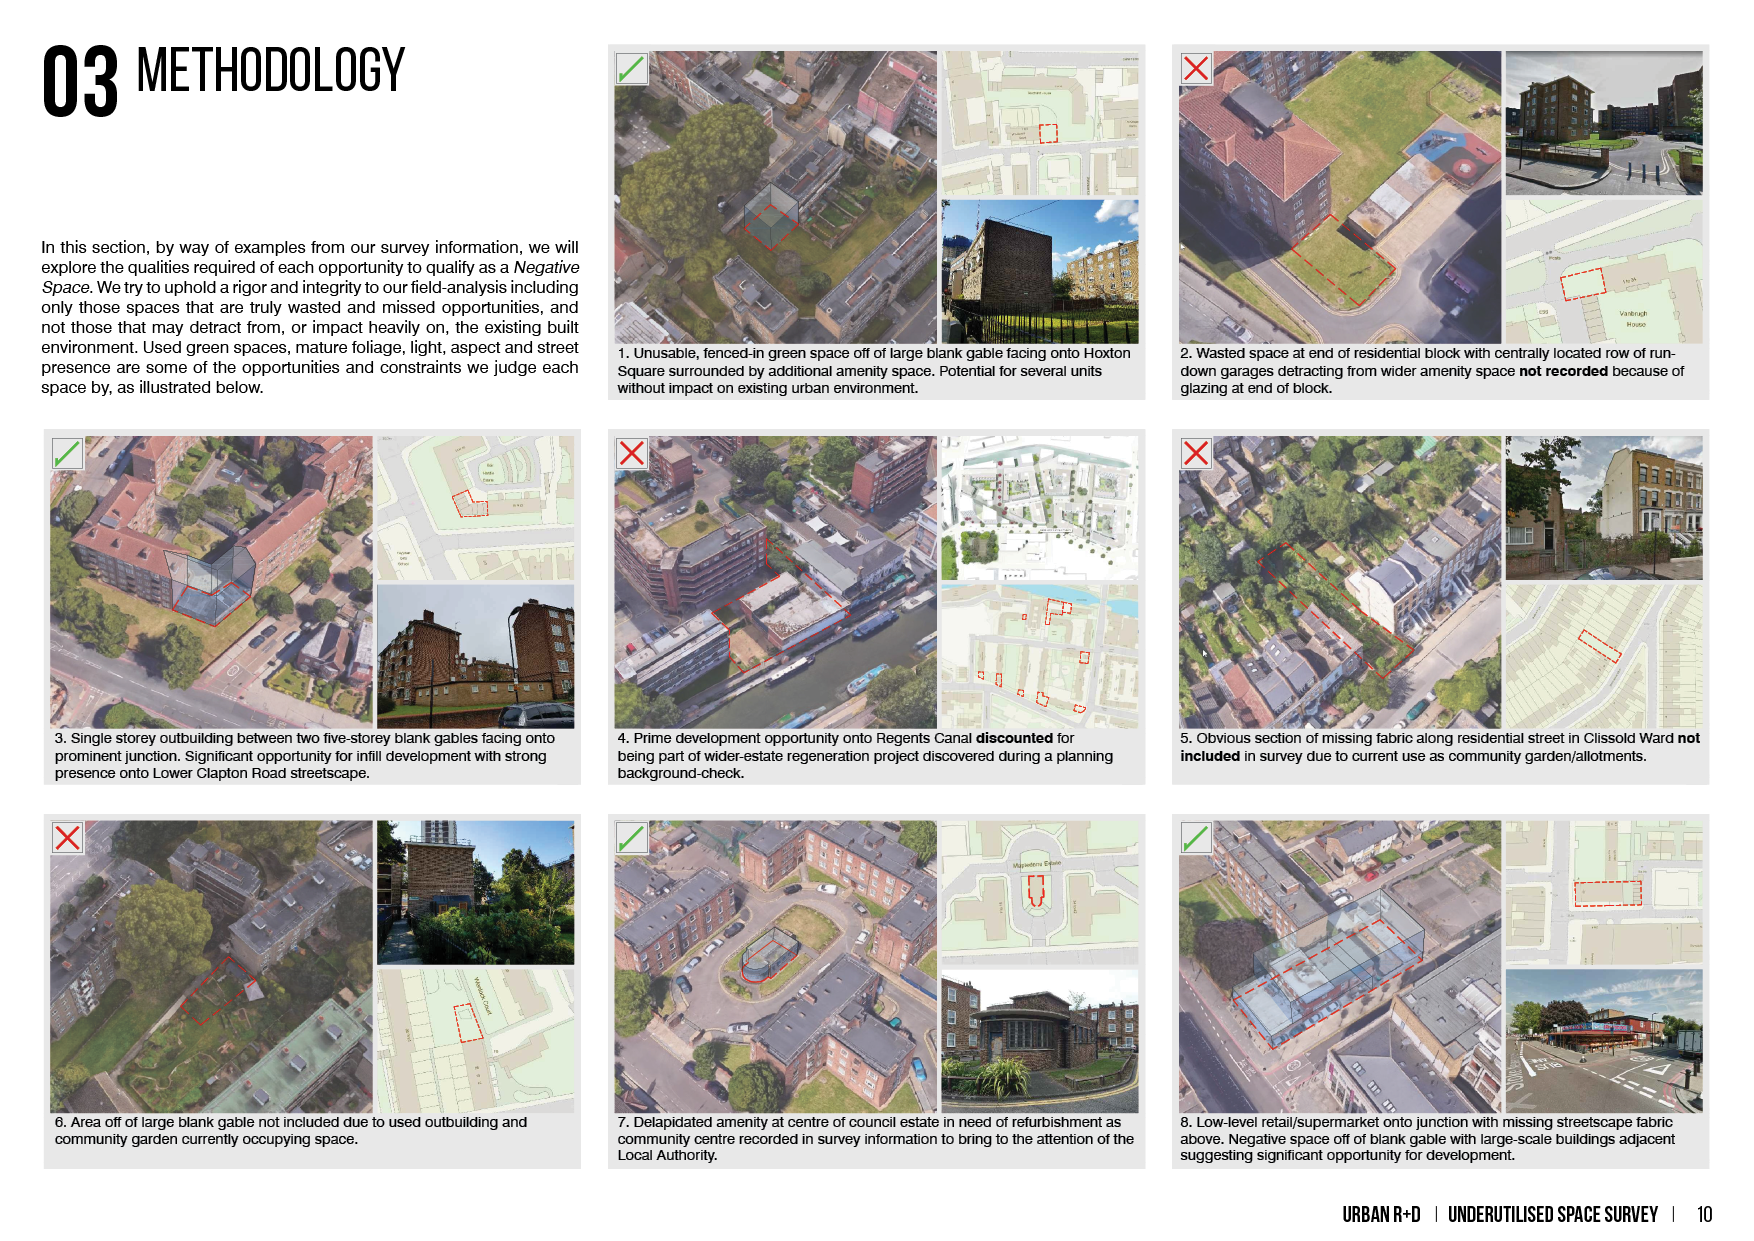 Urban R+D - Underutilised Space Survey10.png